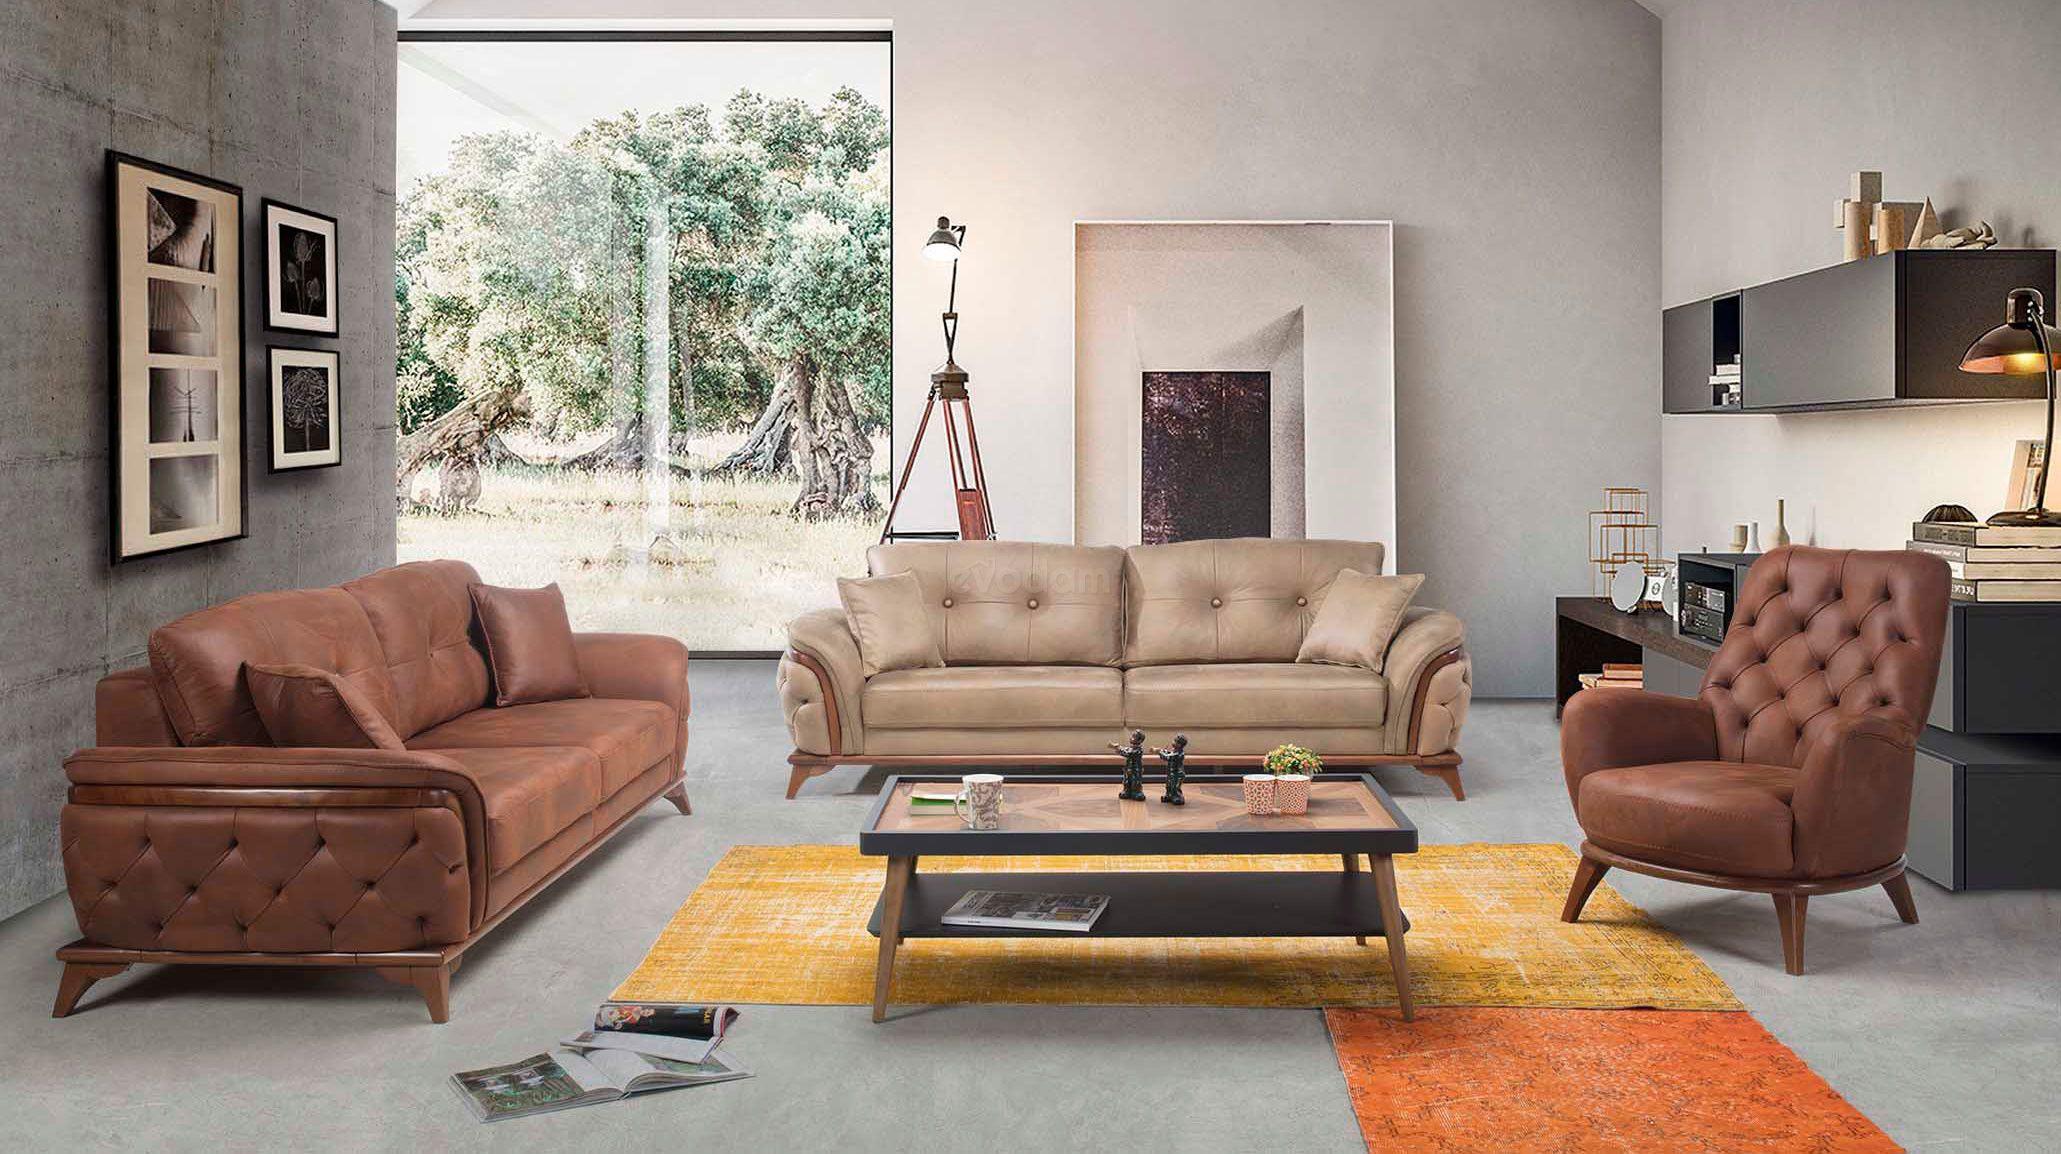 Pin By Mursel Latif On Sofa Furniture Sofa Set Furniture Design